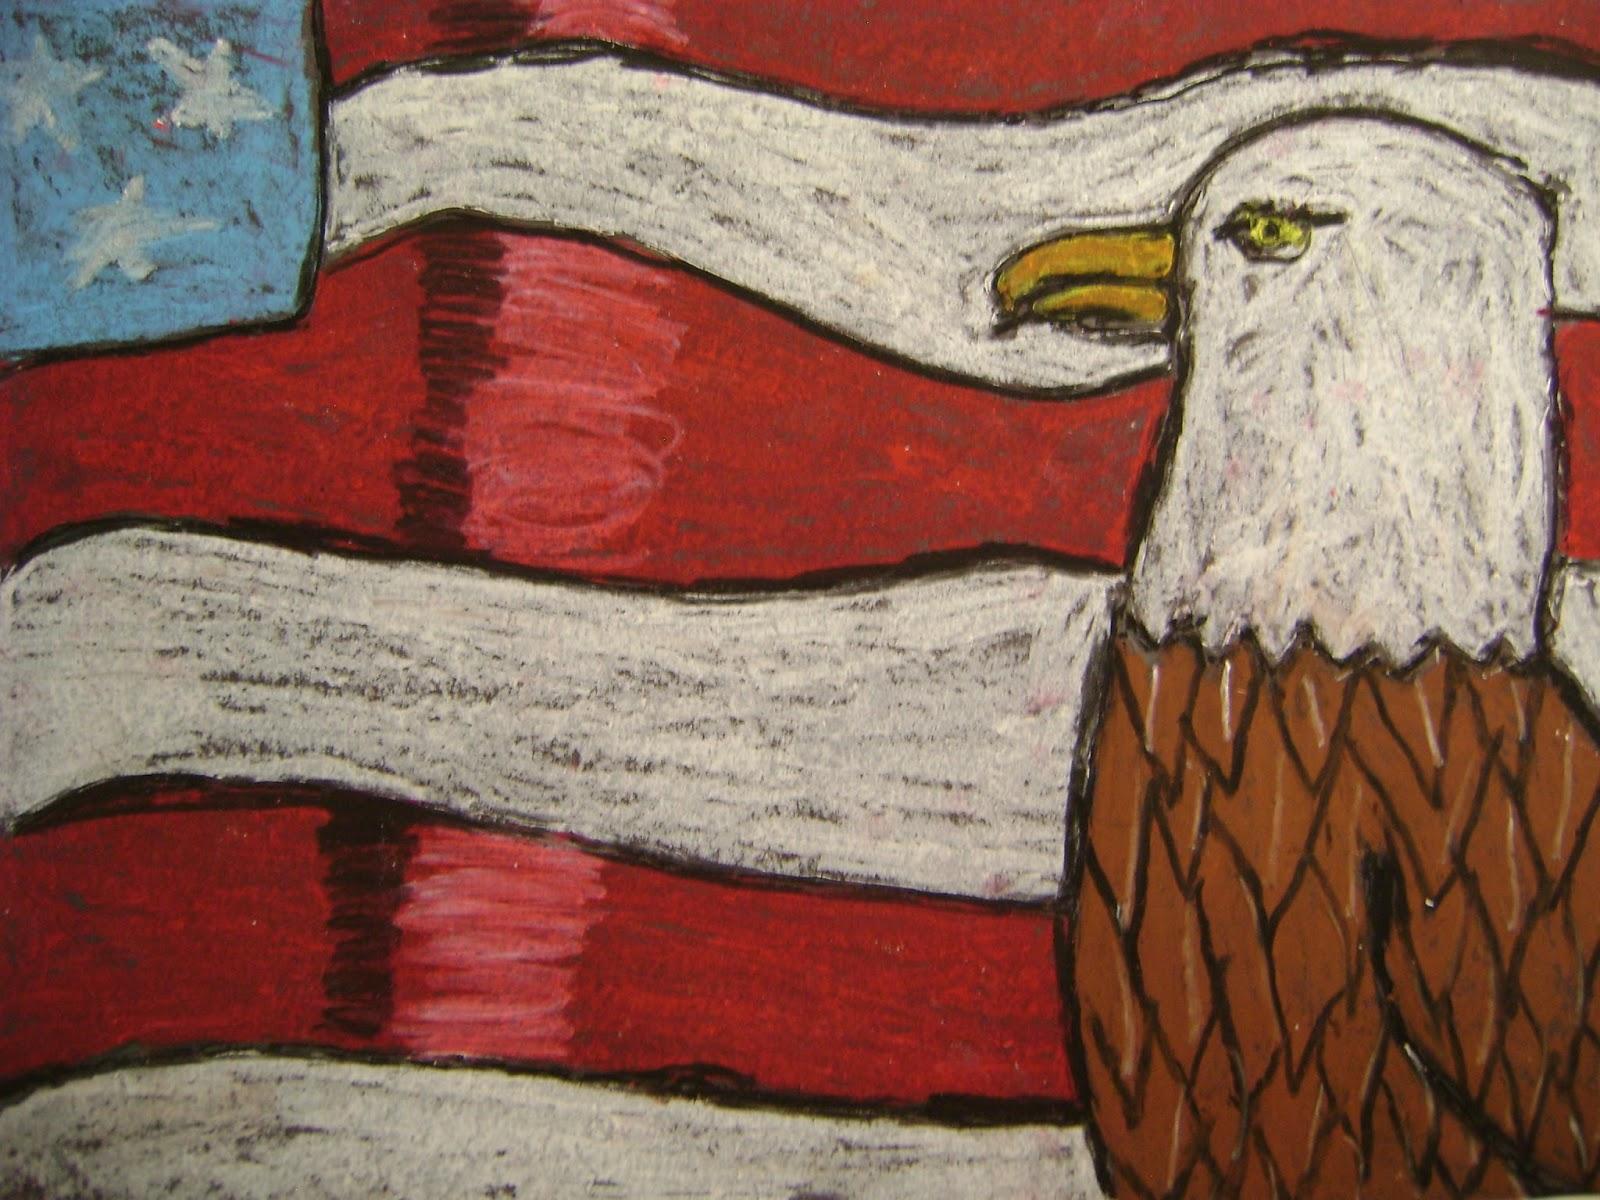 Top 100 (United States) songs of American Patriotism